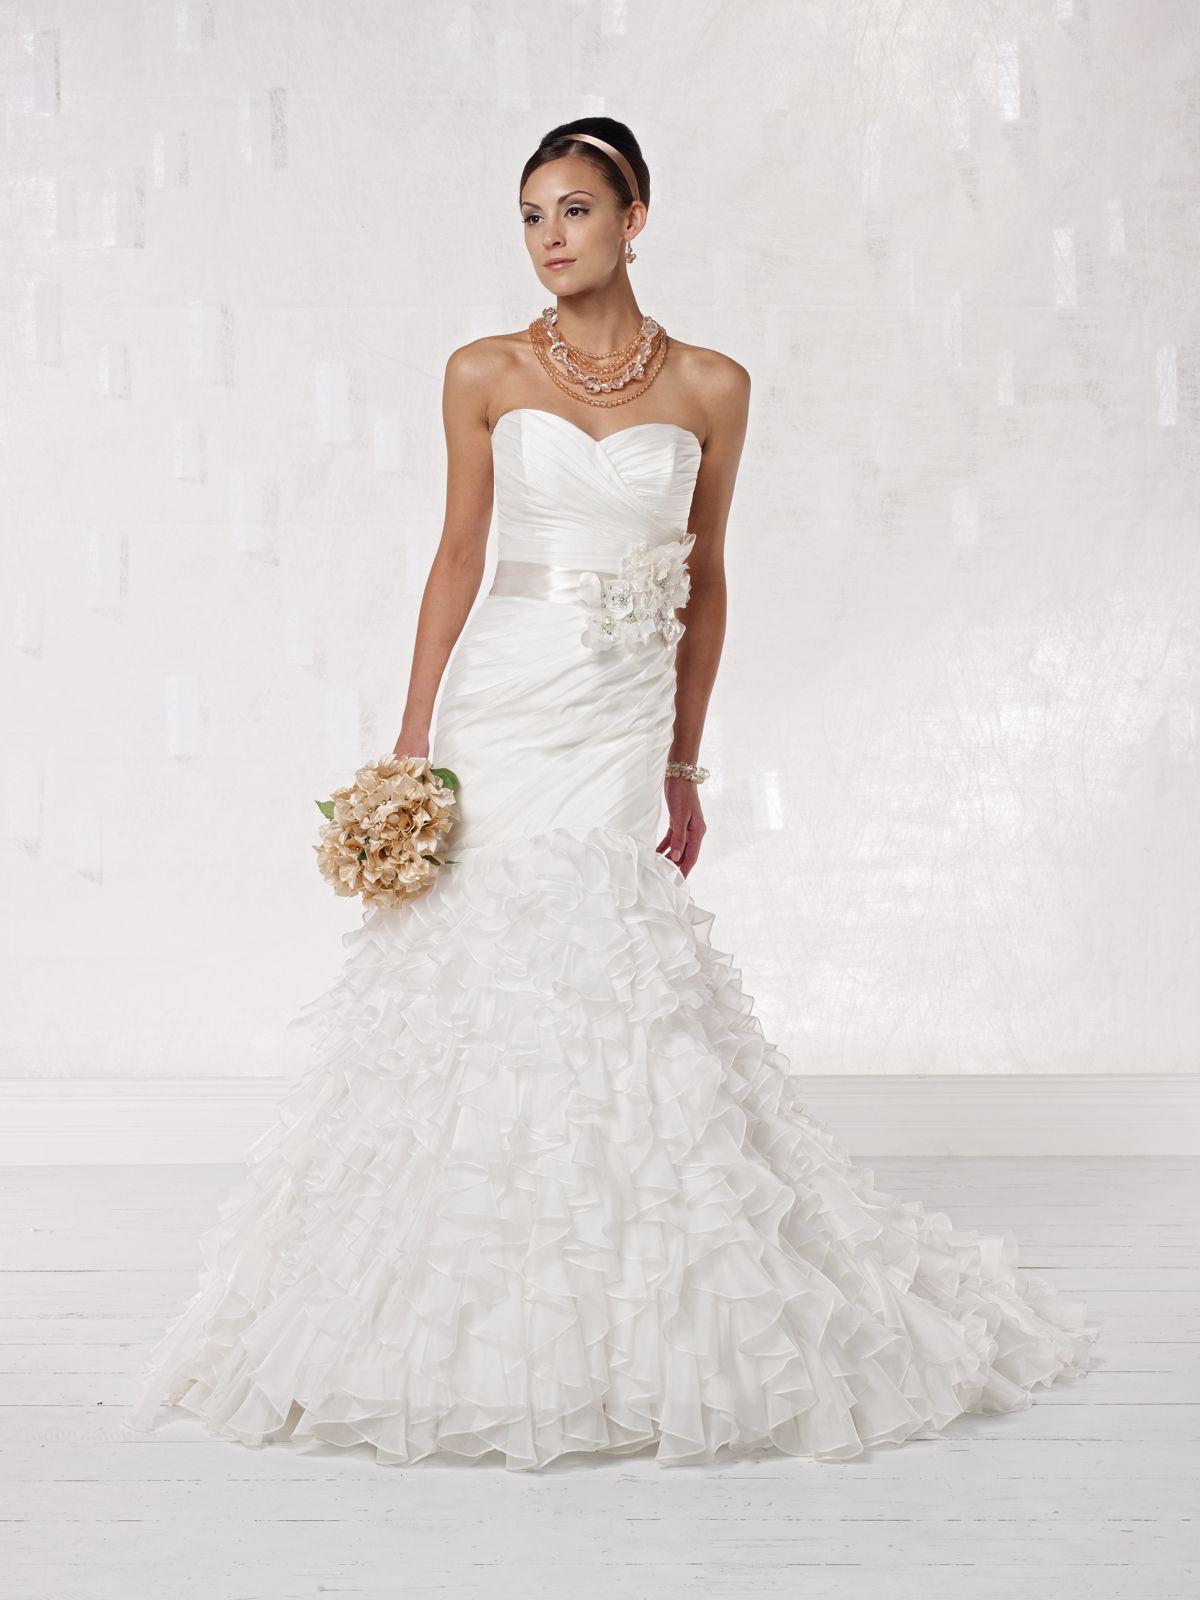 Kathy ireland for mon cheri wedding dresses style no for